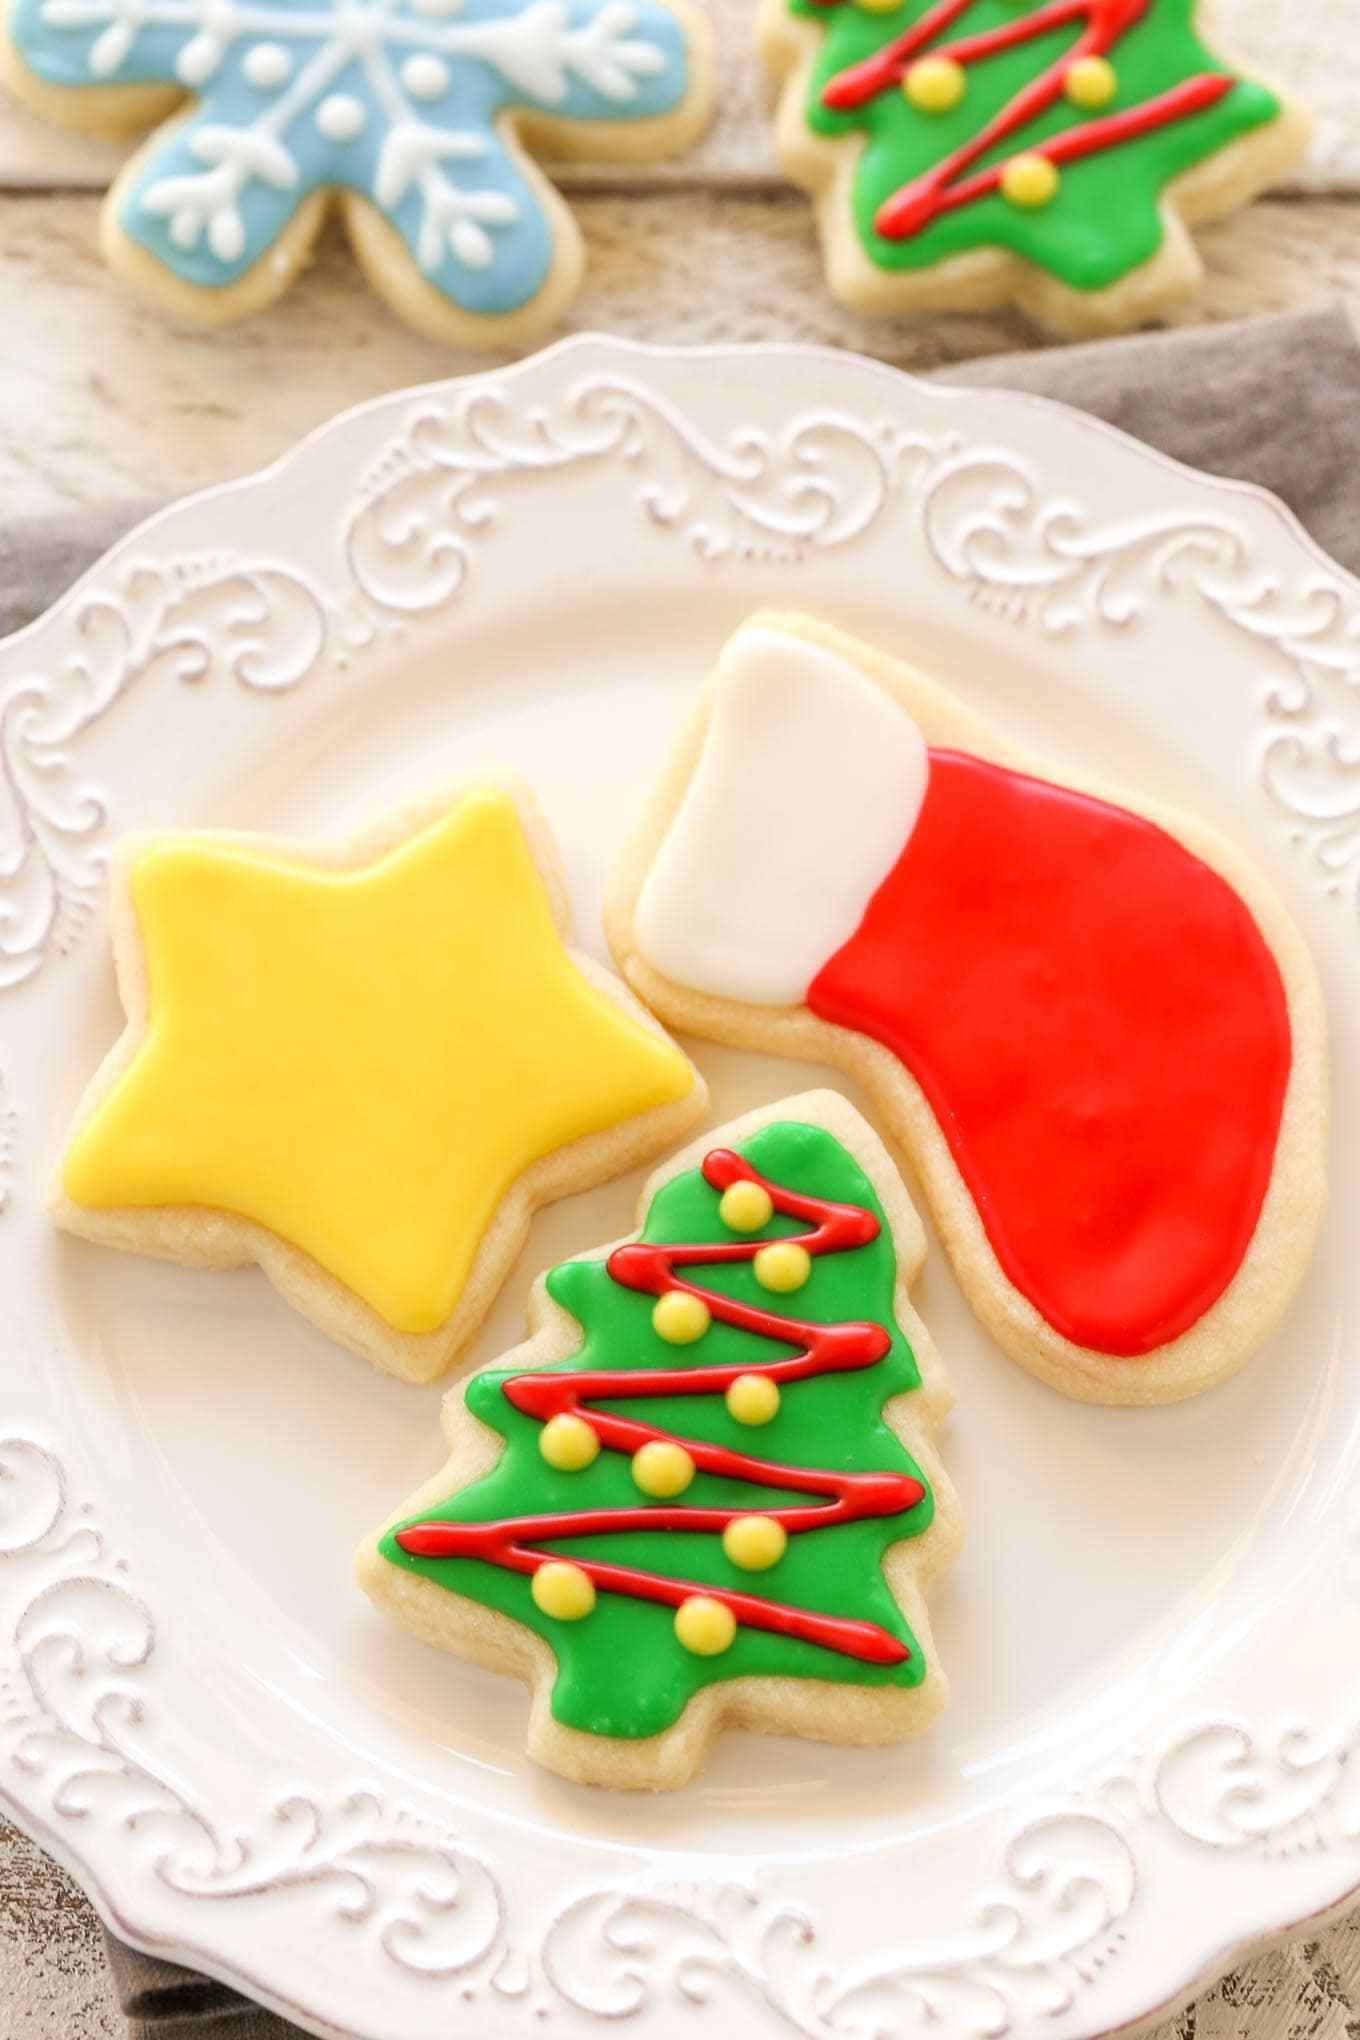 Easy Christmas Sugar Cookies  Soft Christmas Cut Out Sugar Cookies Live Well Bake ten